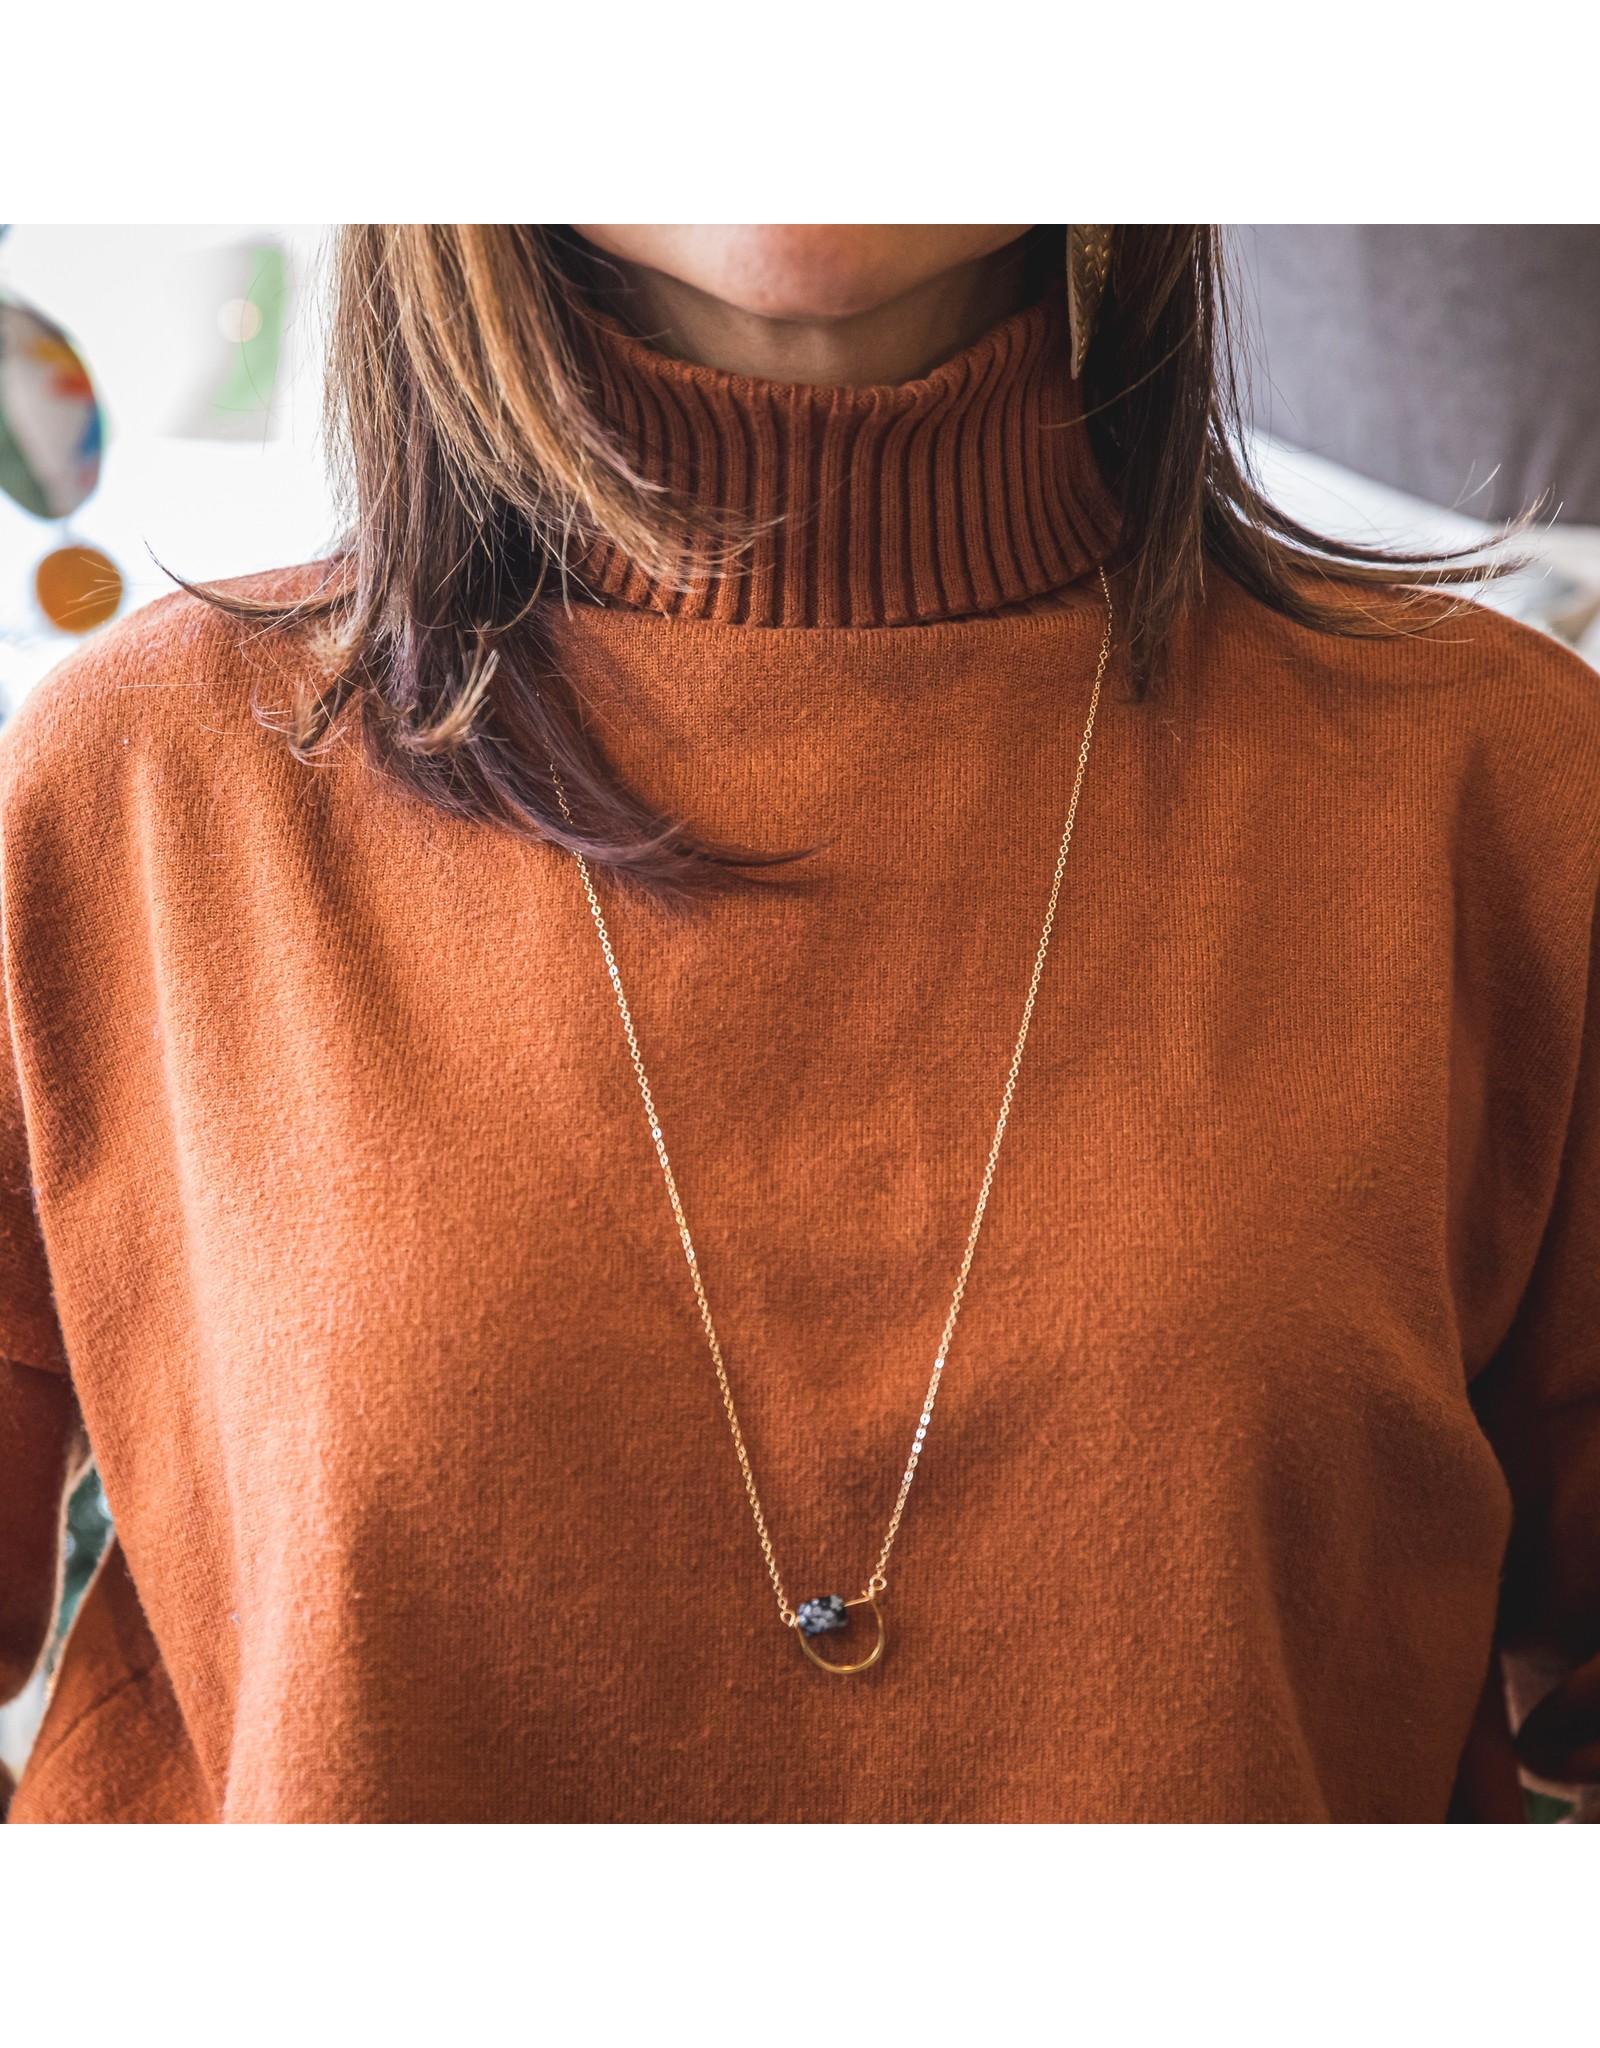 Forai Necklaces